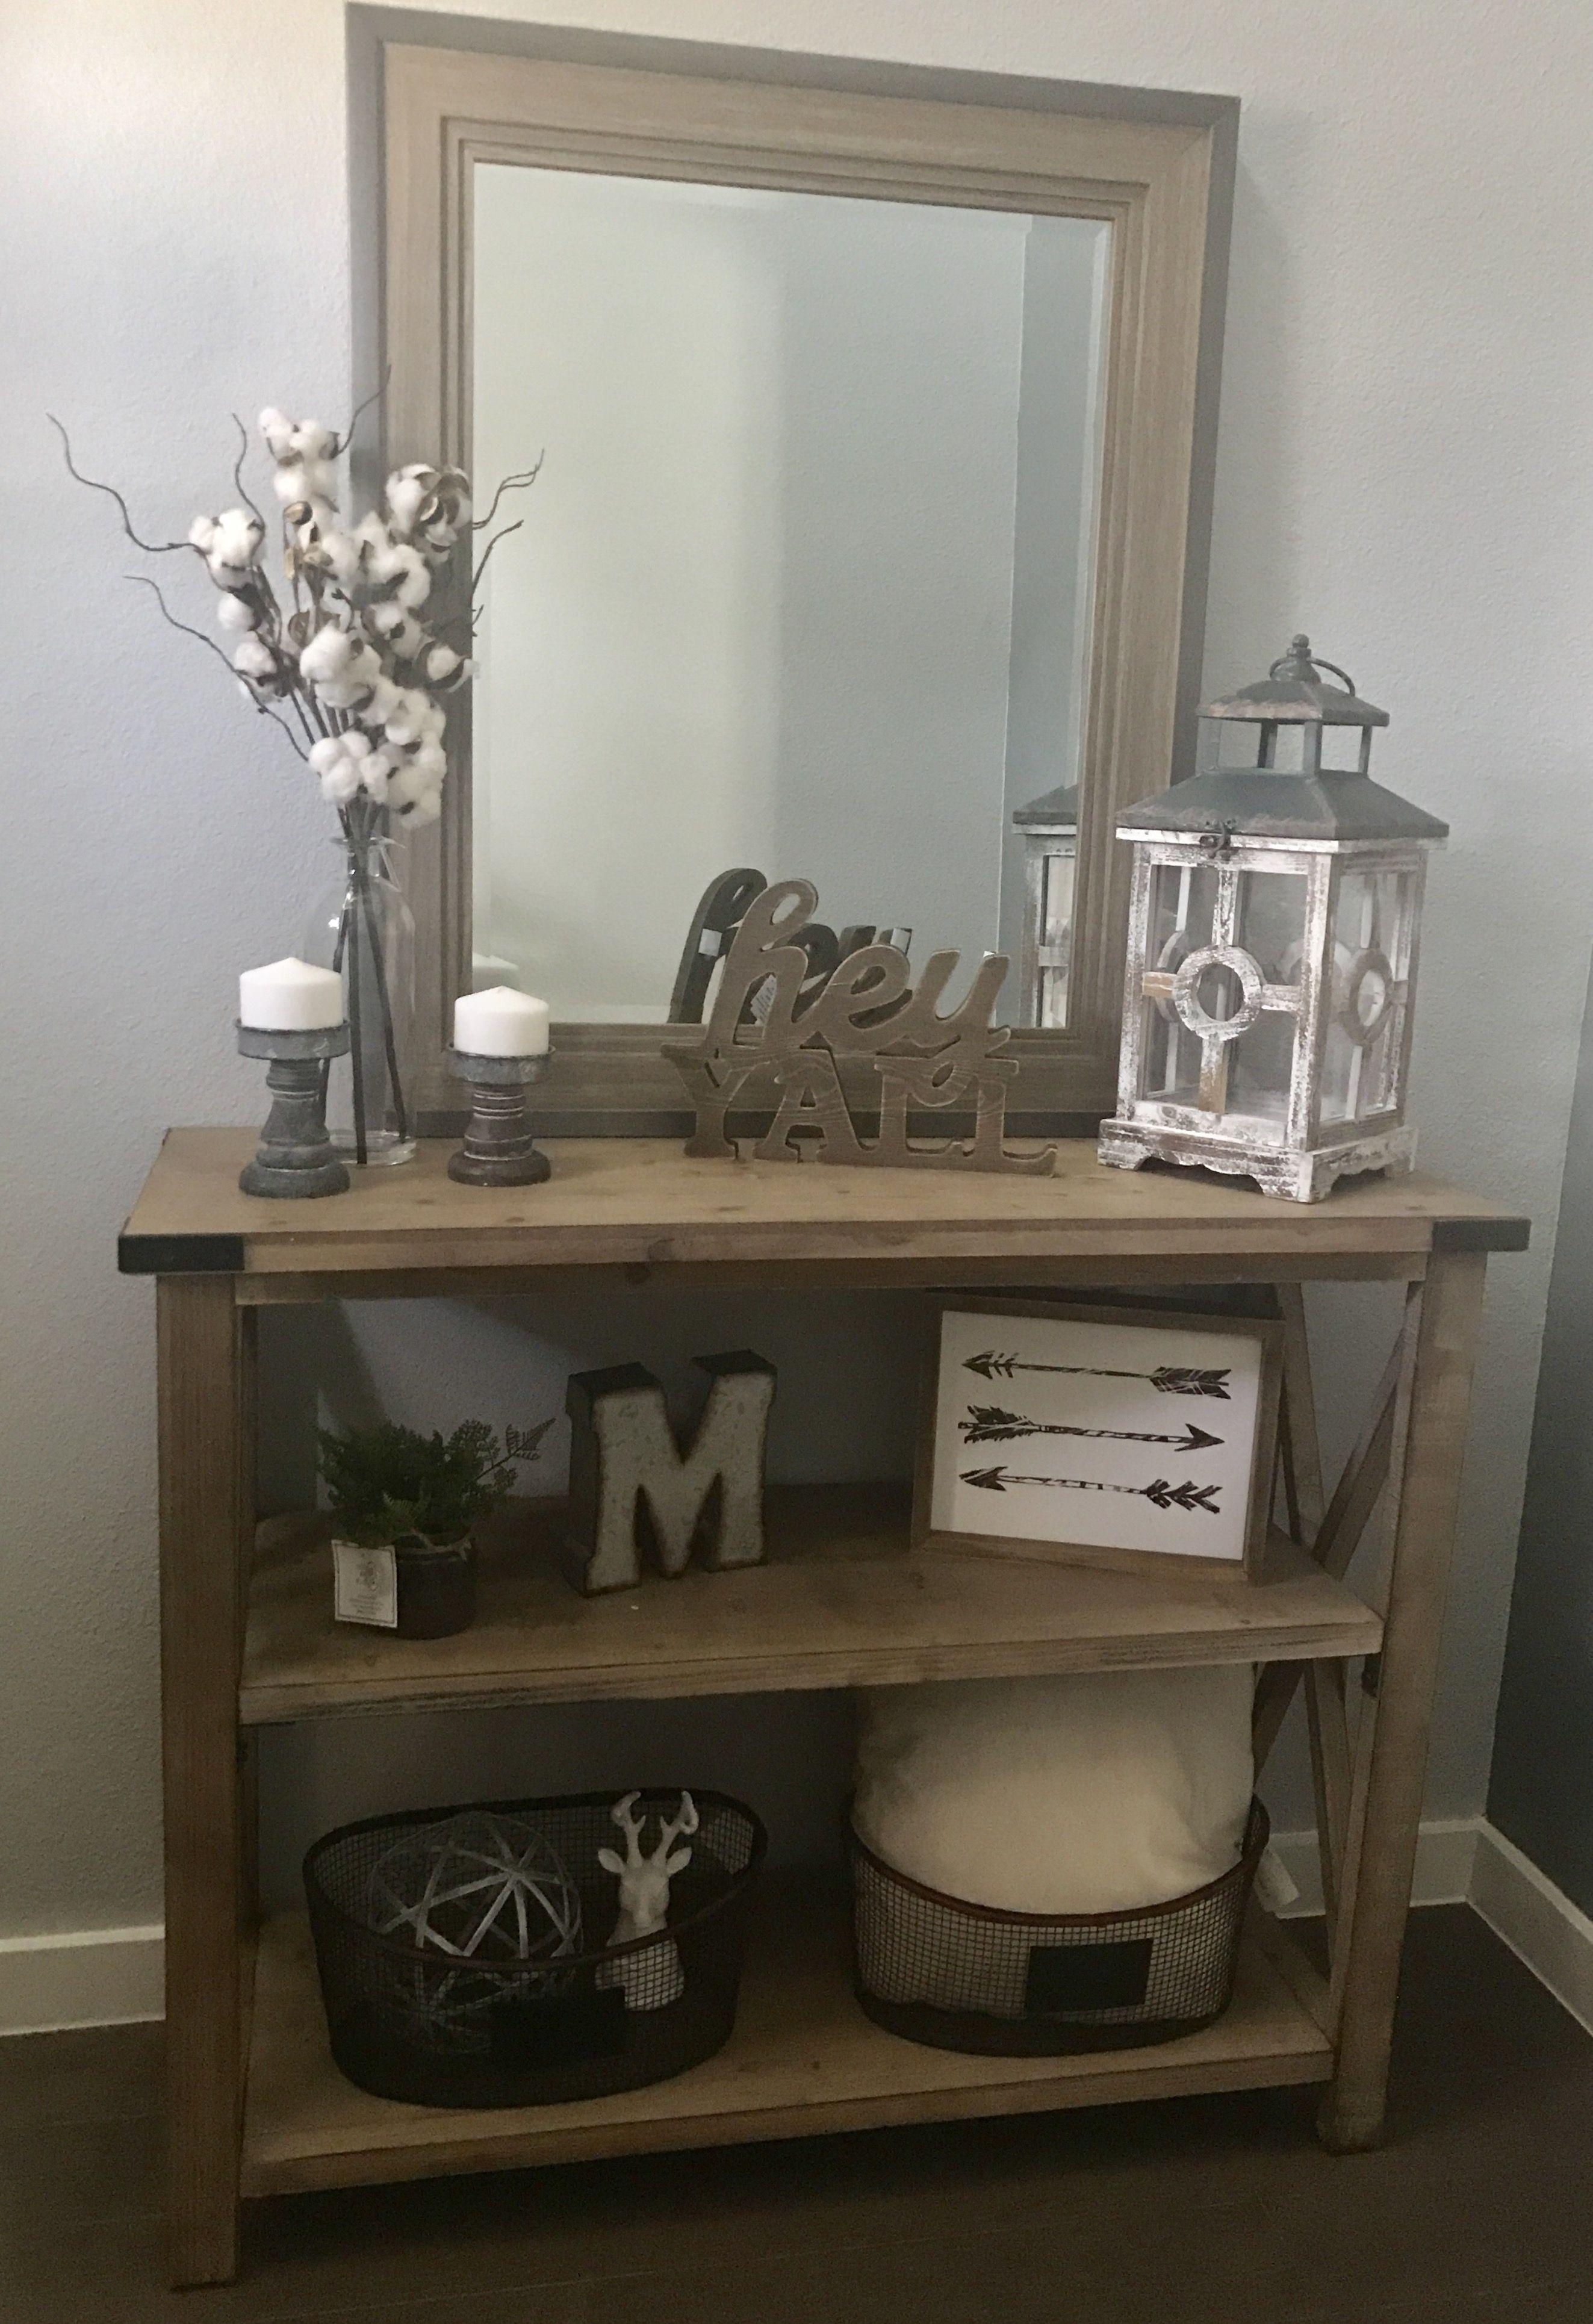 New Modern Farmhouse Entry Way Console Table Decor Mcmillen Home ...